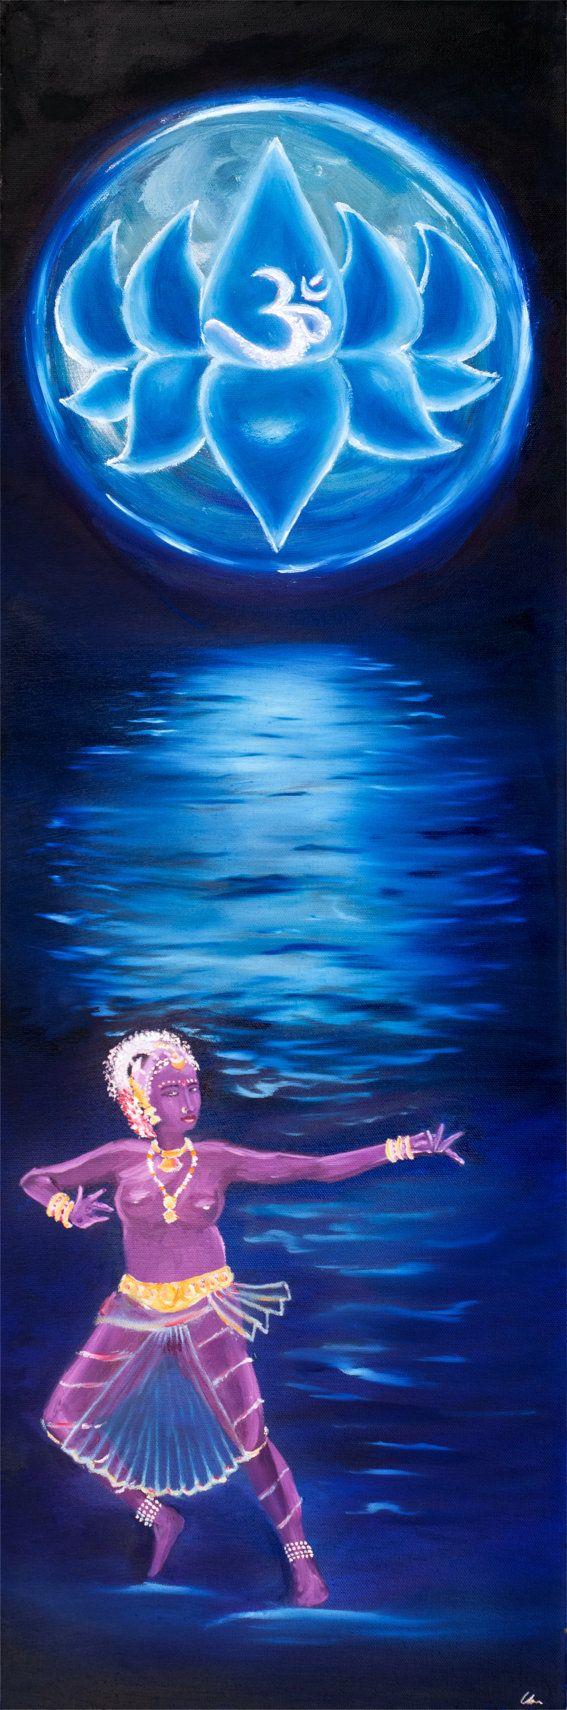 Shakti Lotus Moon Dancer Series by MissSharda on Etsy